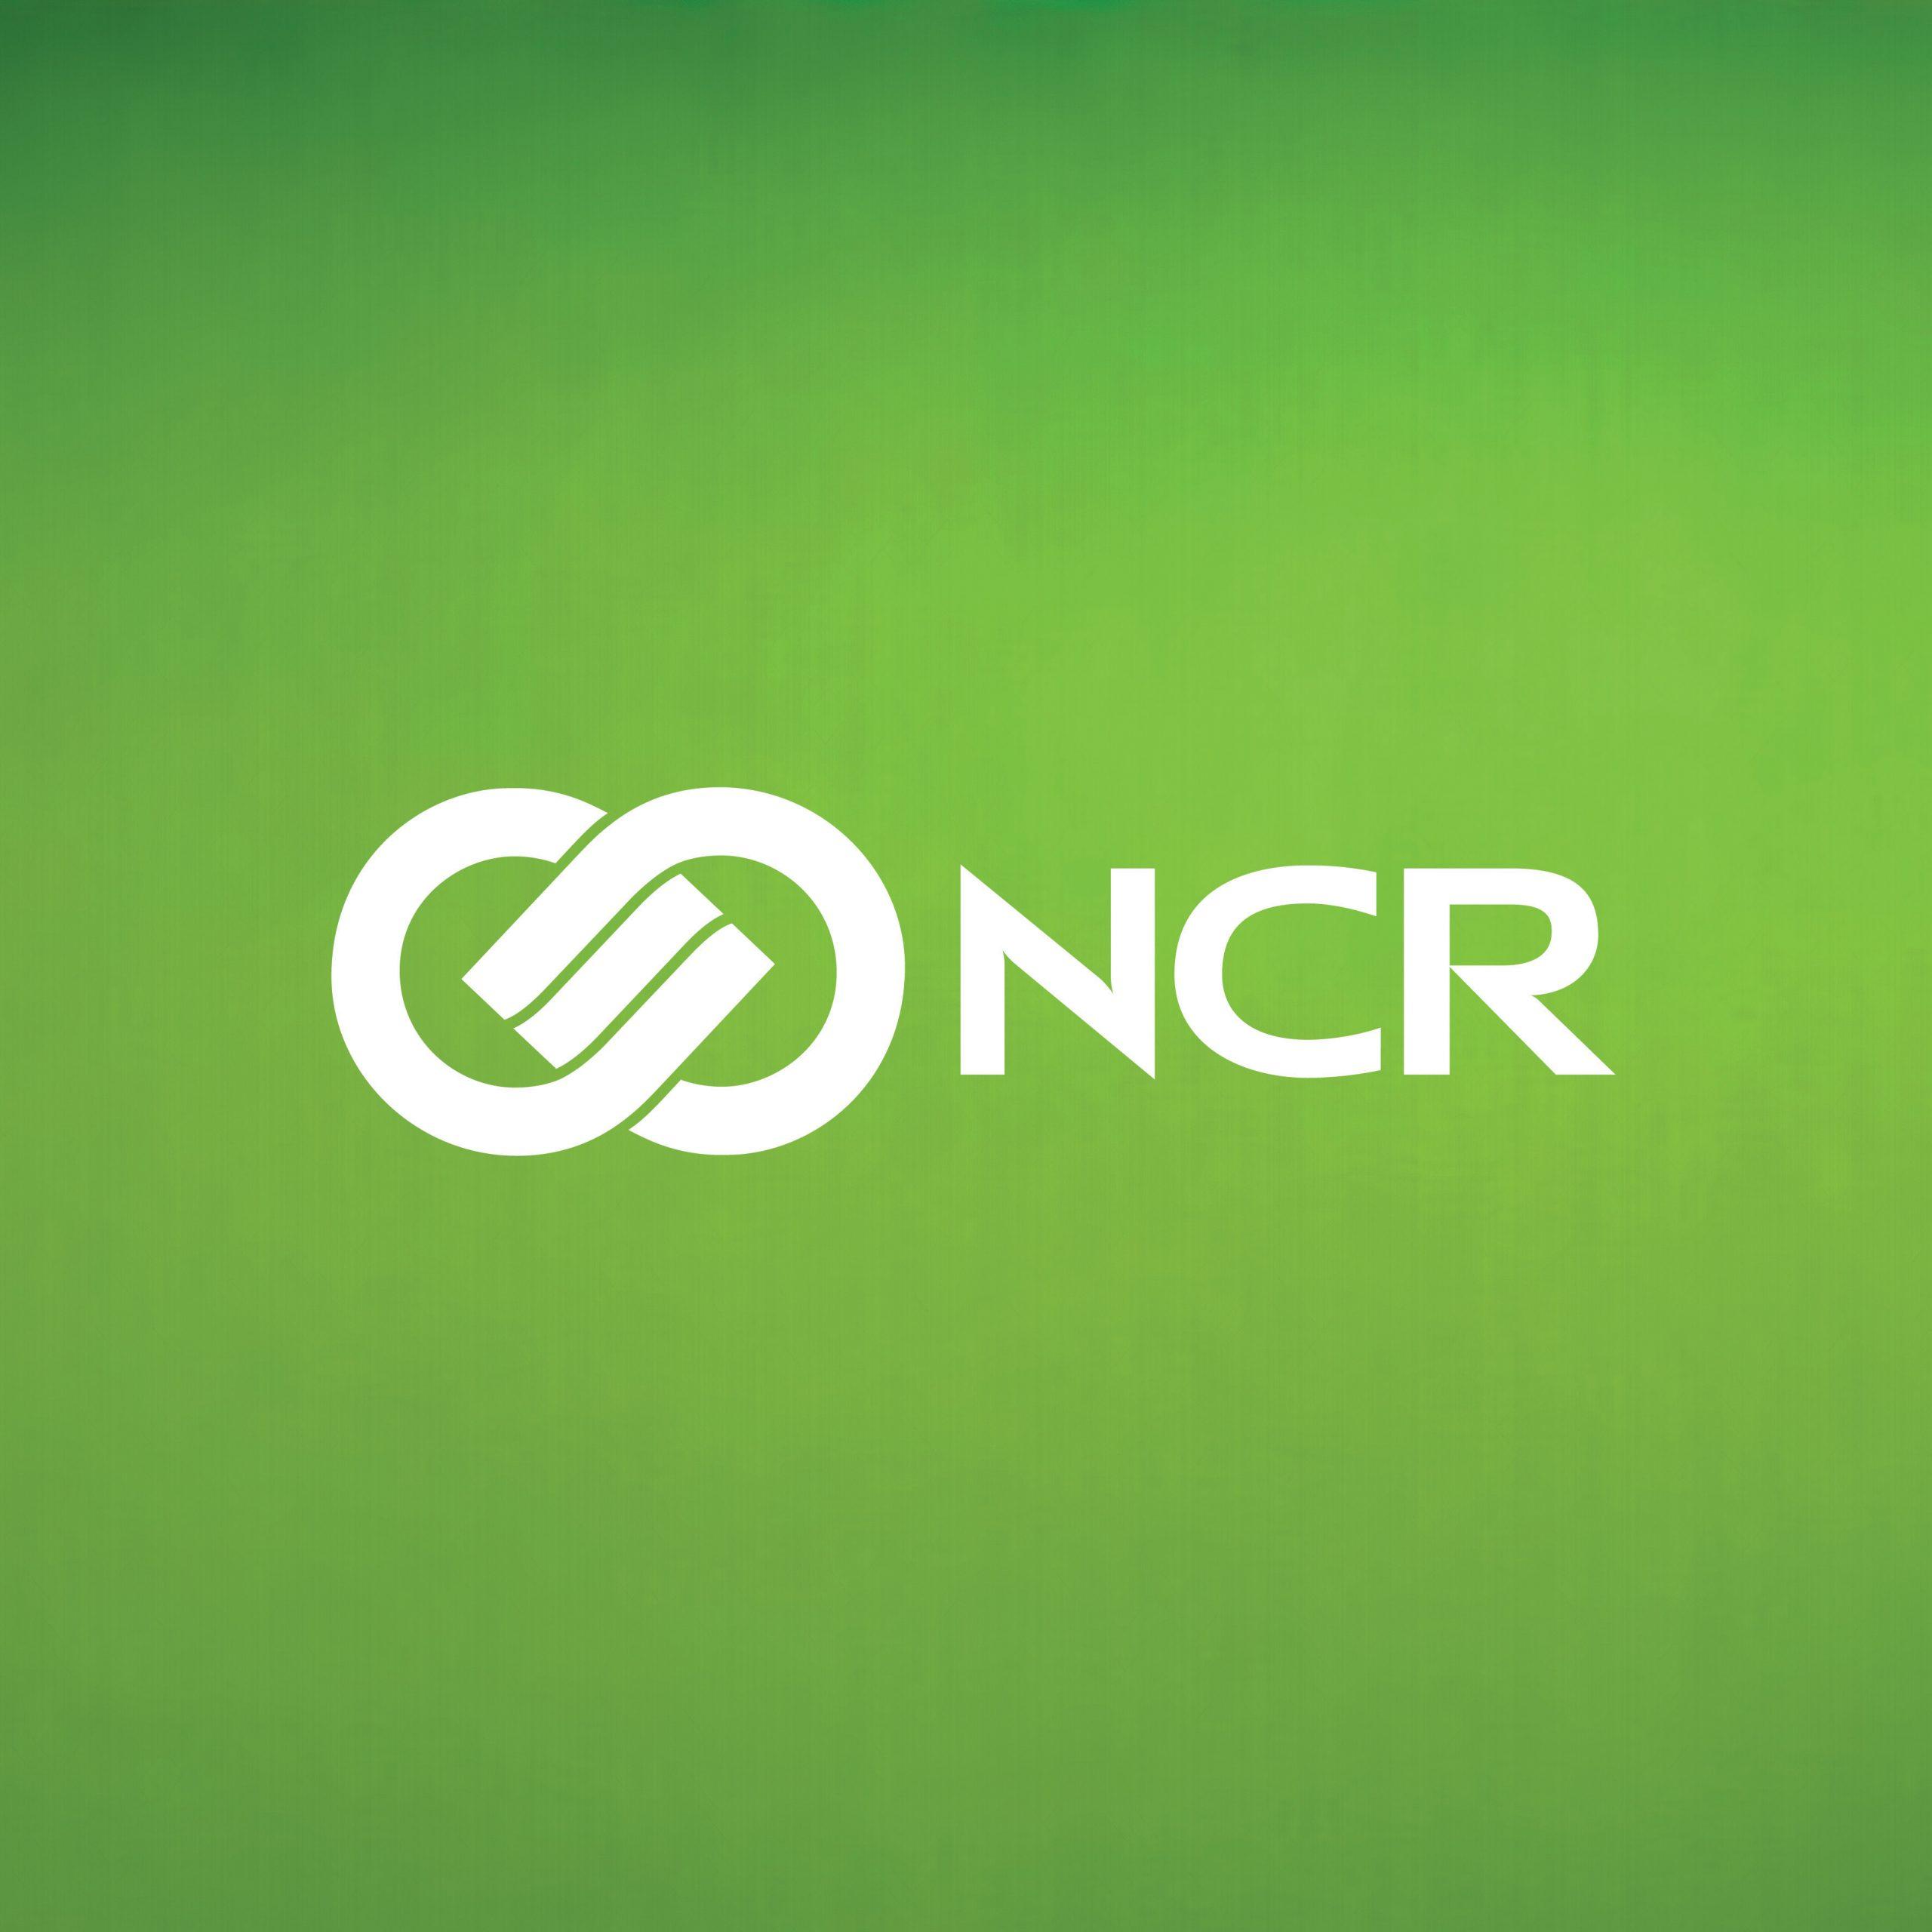 NCRLogo